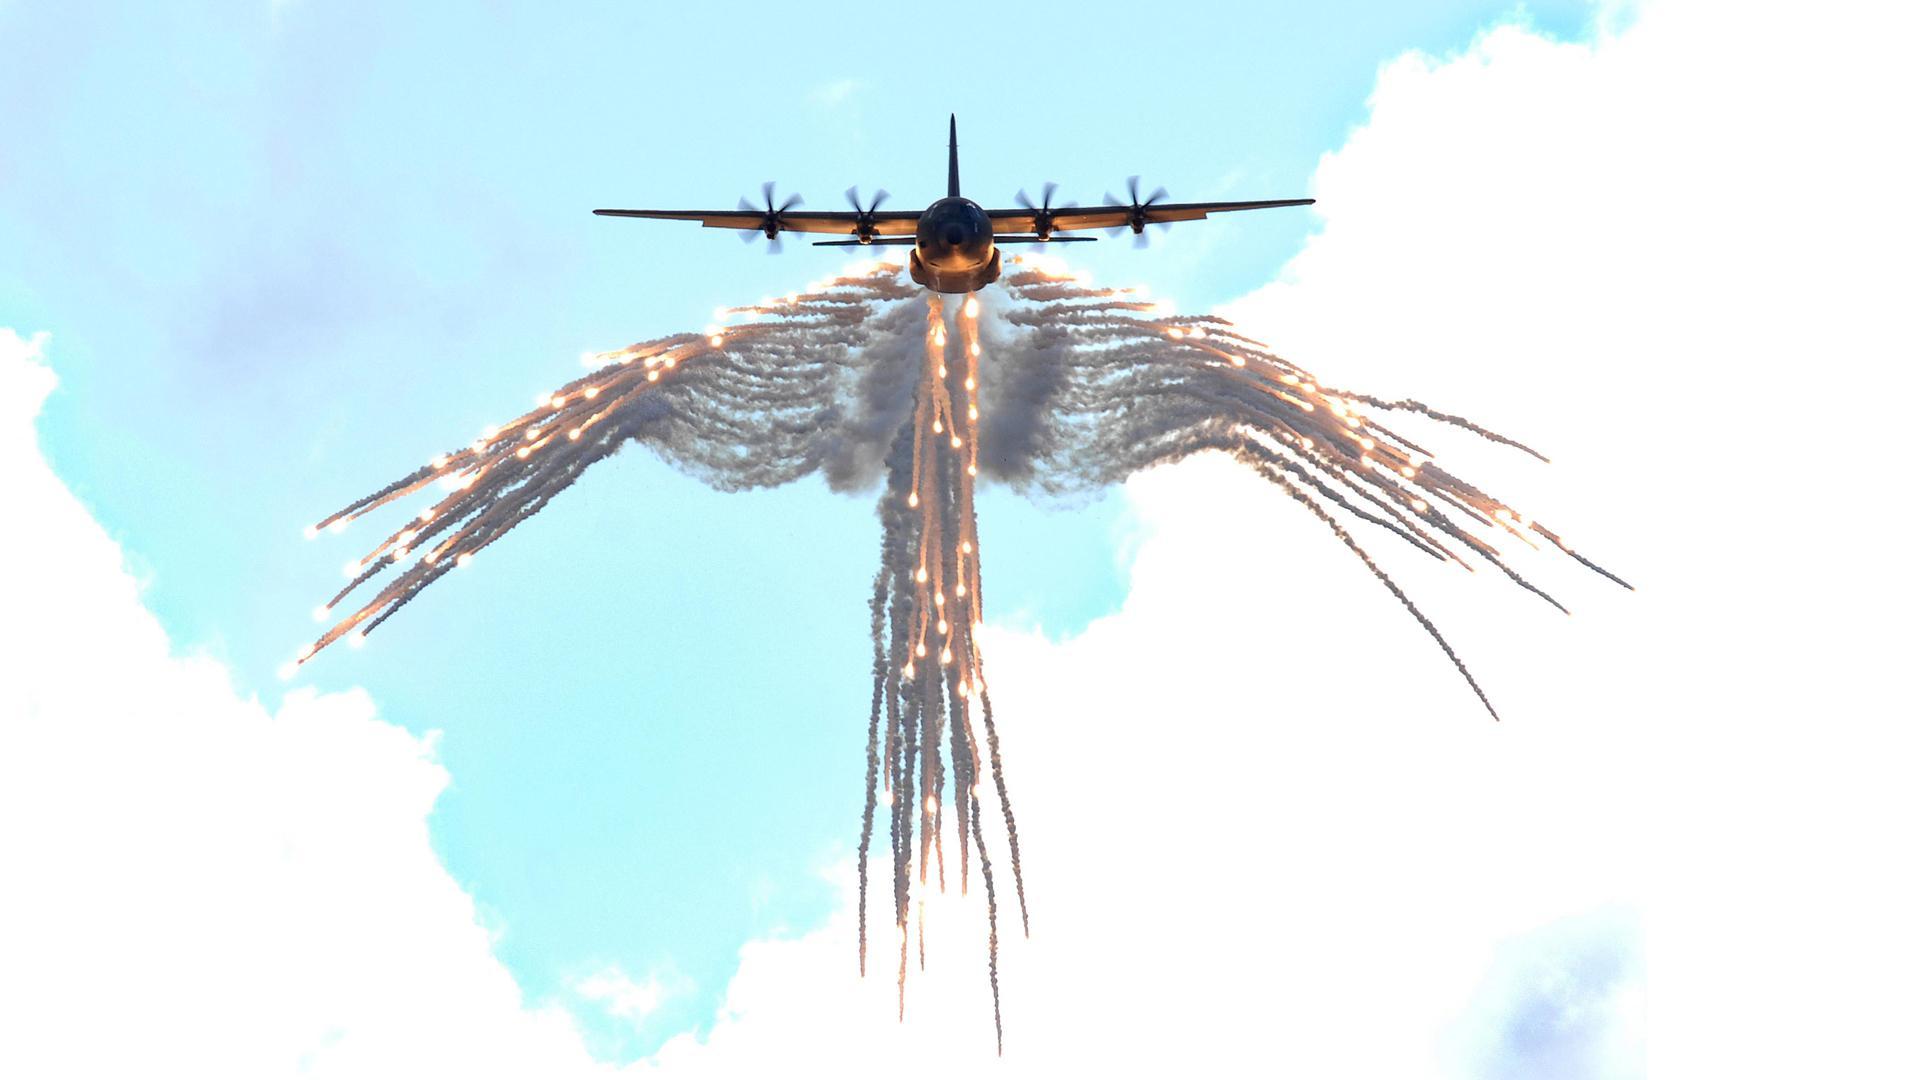 Lockheed C-130 Hercules wallpapers HD quality